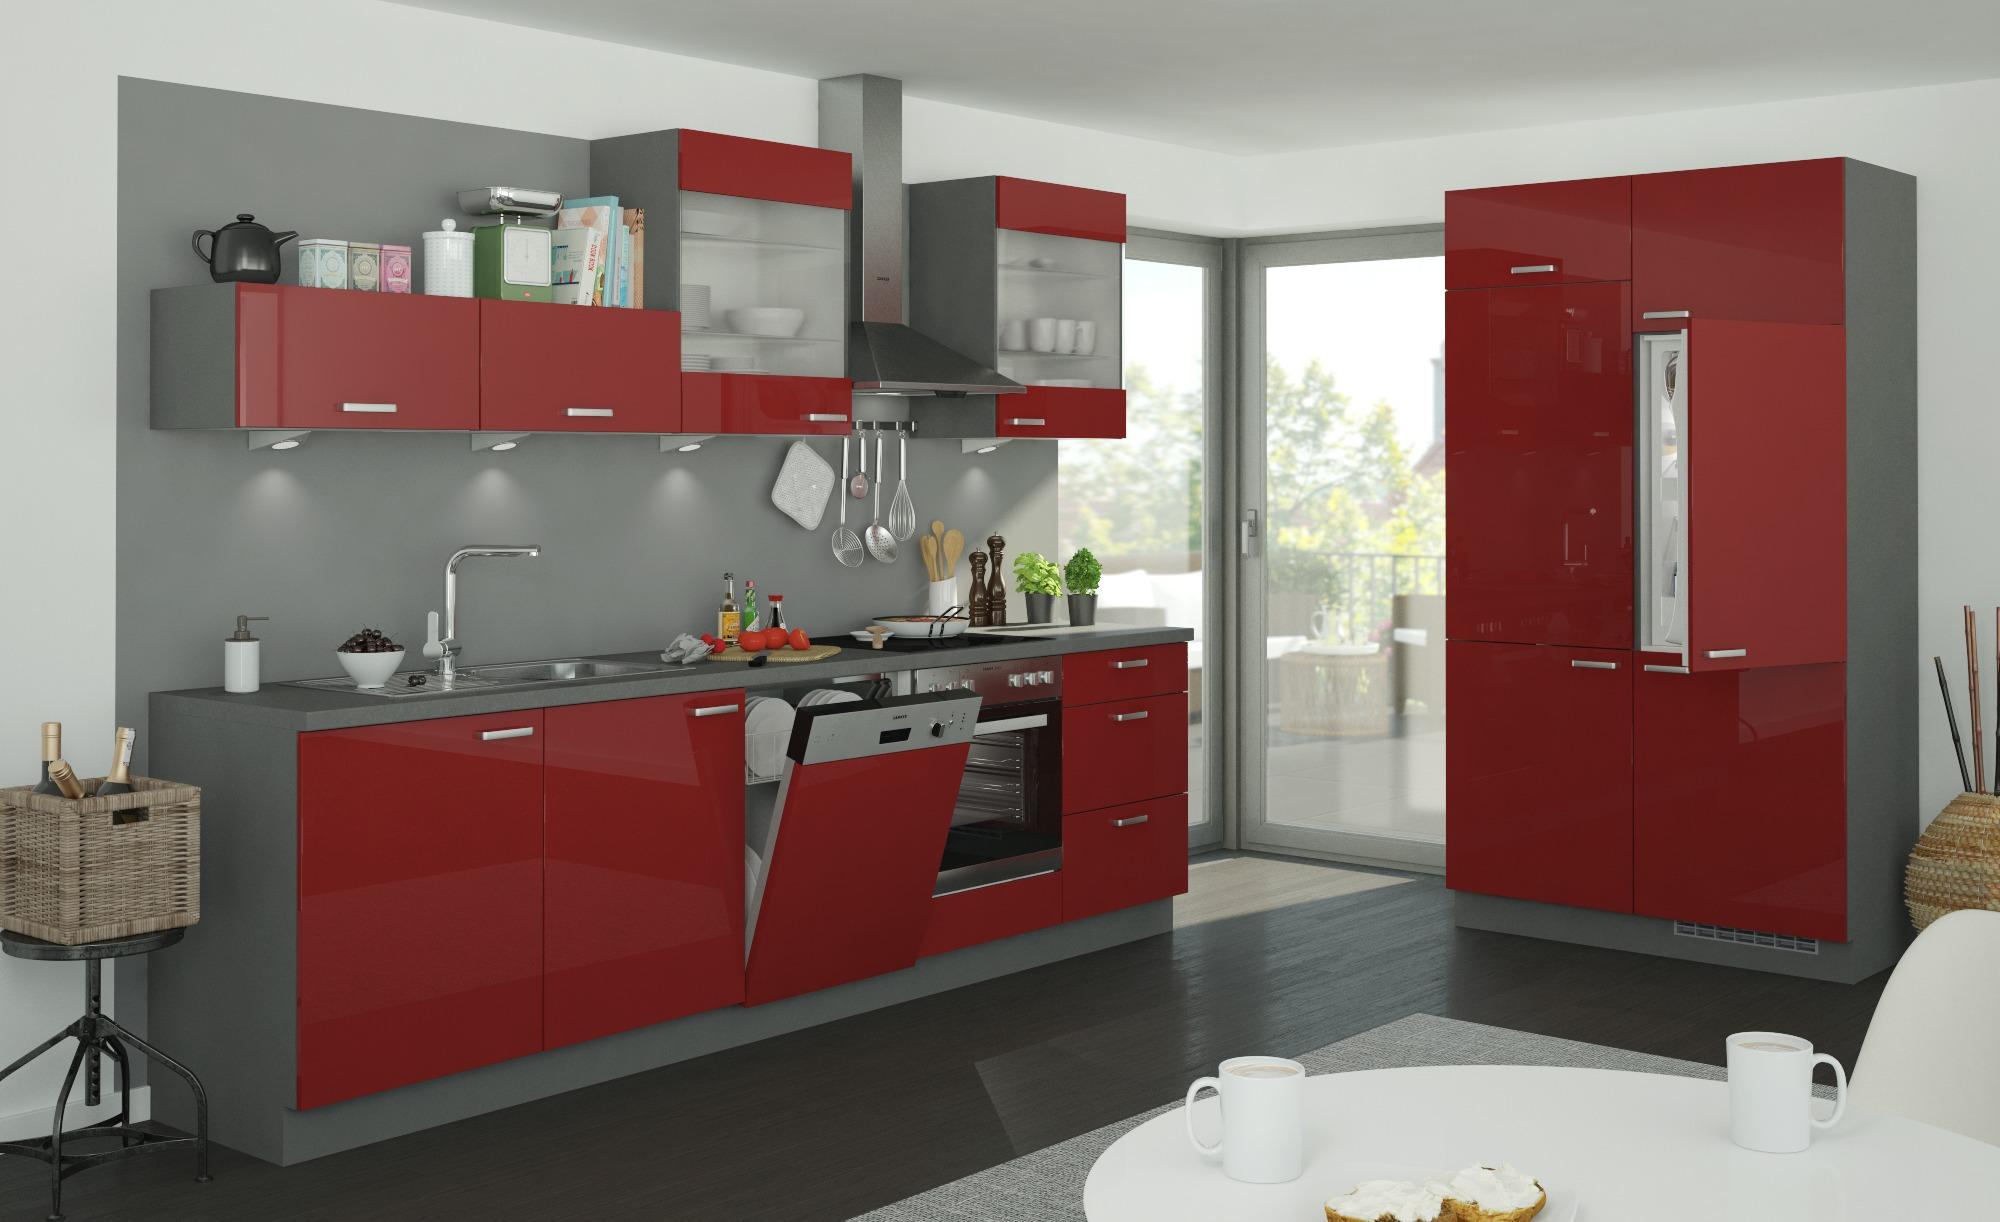 Full Size of Küche Ohne Elektrogeräte Gebraucht Küche Ohne Elektrogeräte Kaufen Sinnvoll Was Kostet Eine Küche Ohne Elektrogeräte Komplette Küche Ohne Elektrogeräte Küche Küche Ohne Elektrogeräte